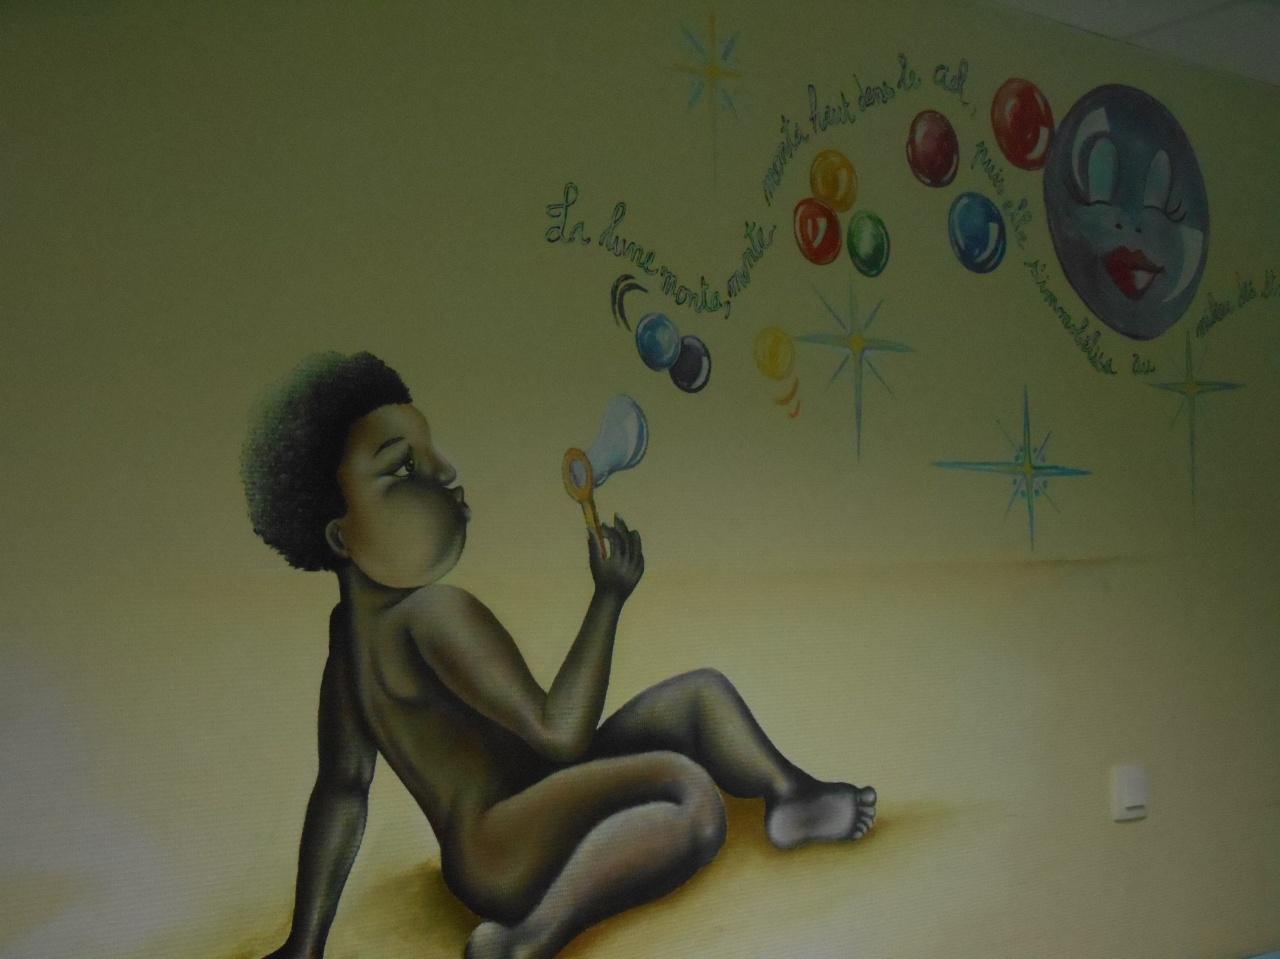 fresque-urgence-pediatrique-mfme.jpg